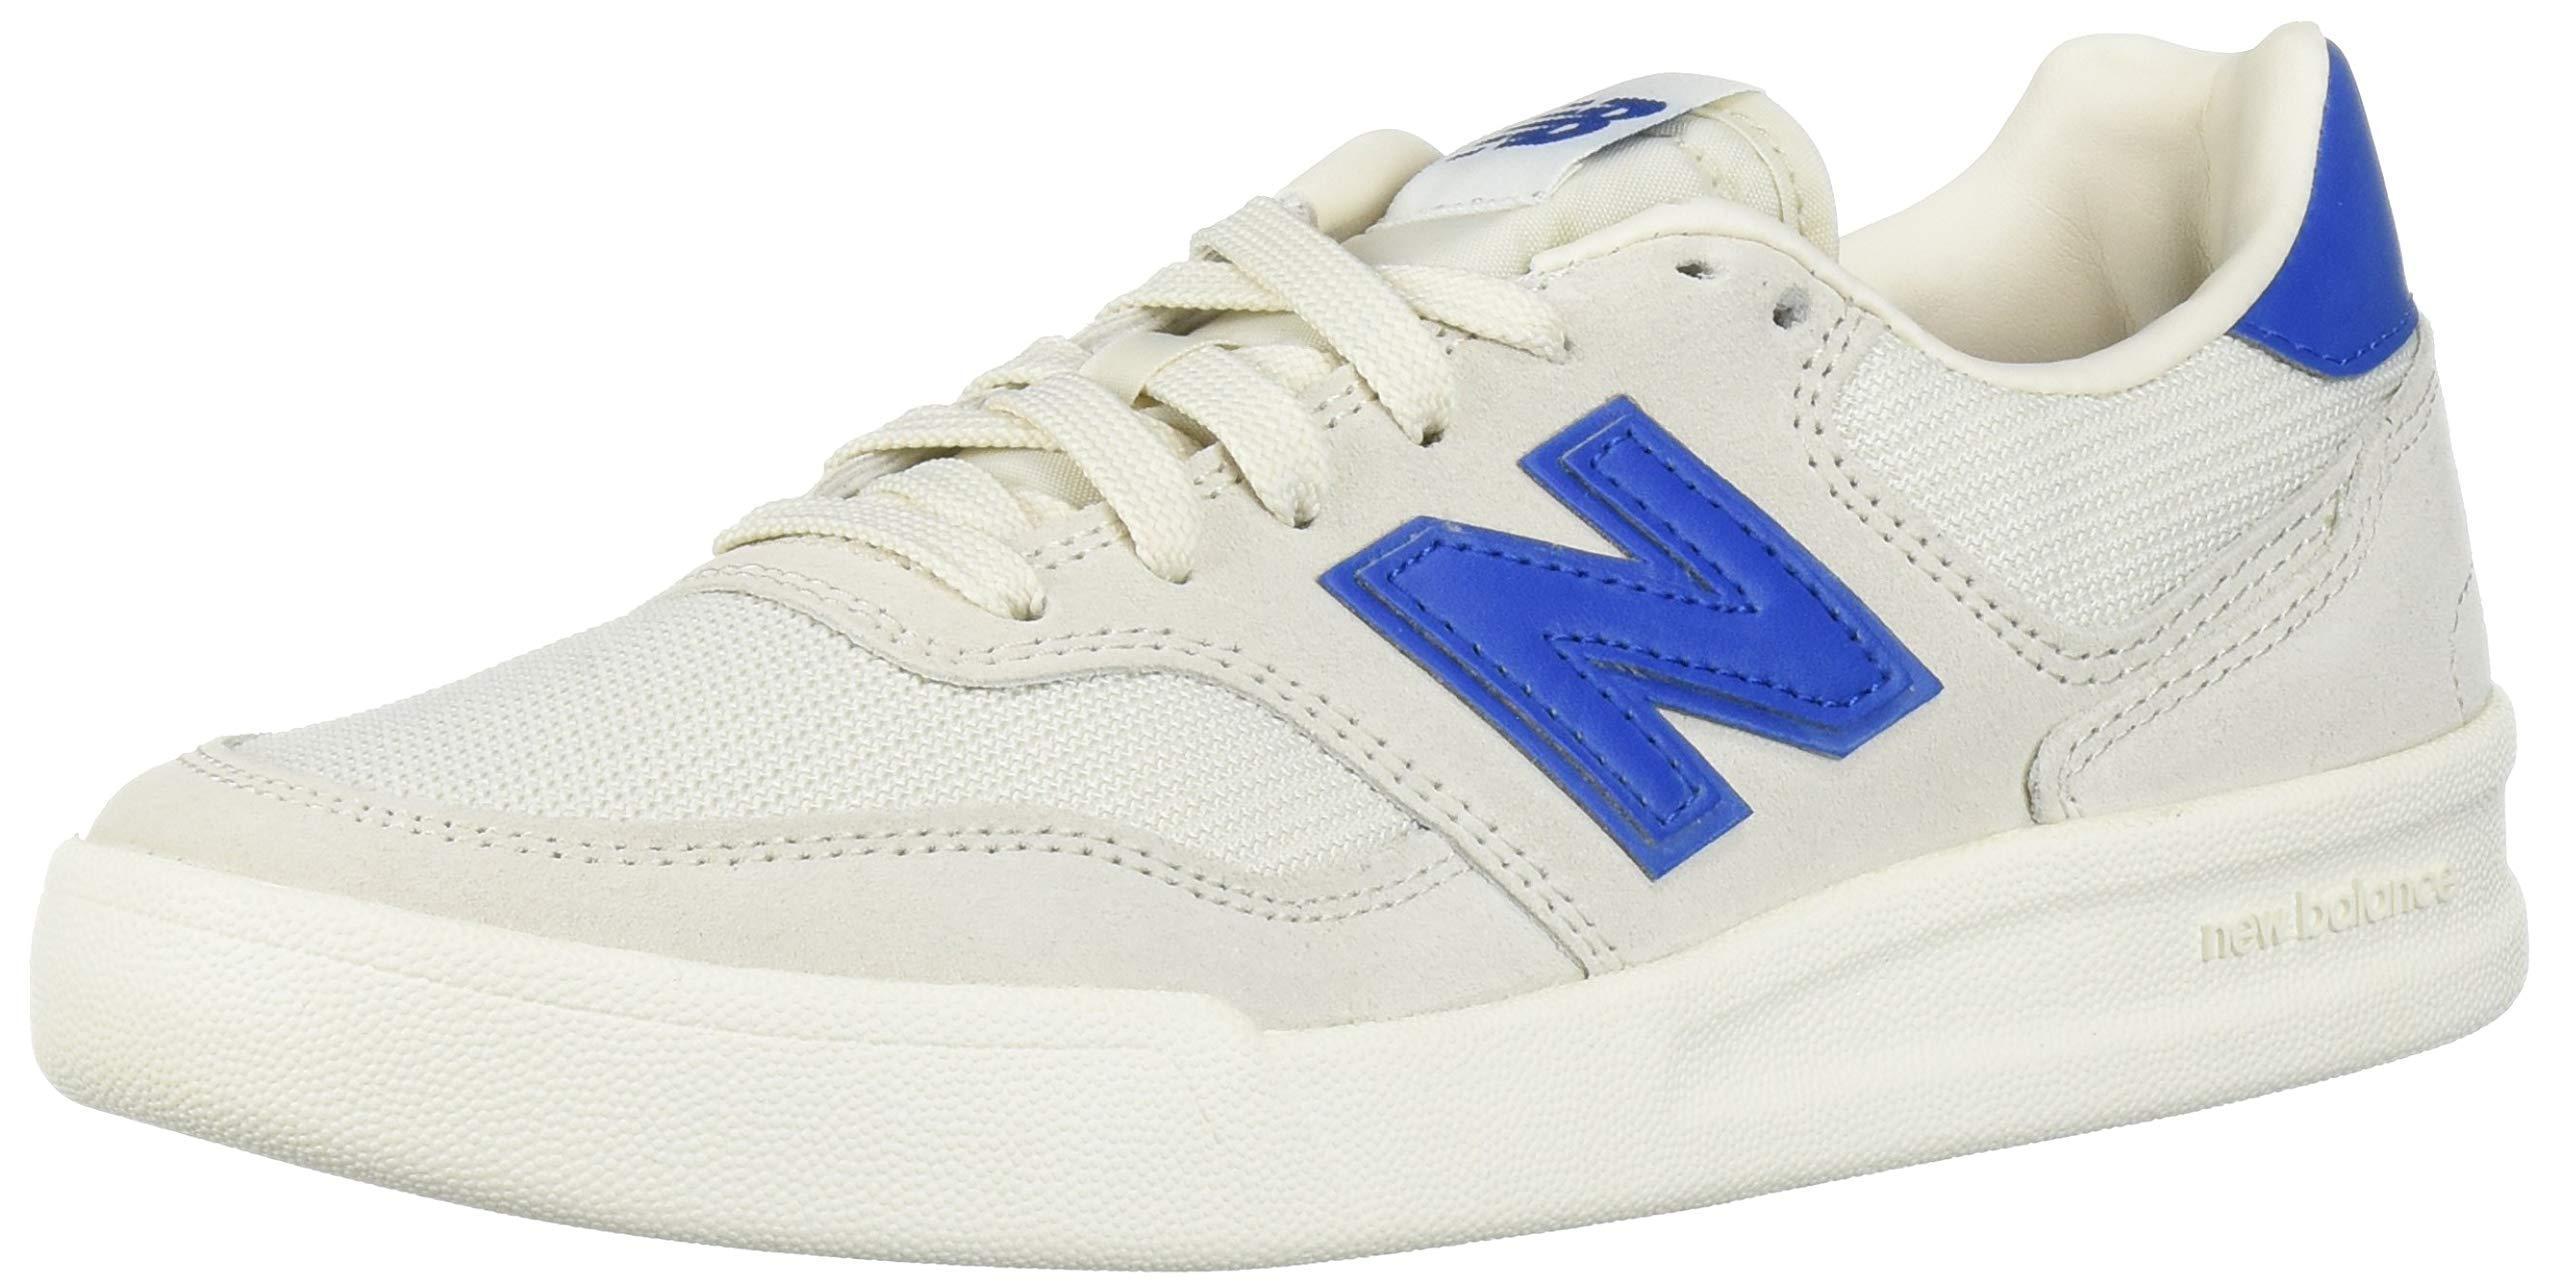 New Balance 300v2 Court Sneaker in Blue for Men - Save 10% - Lyst